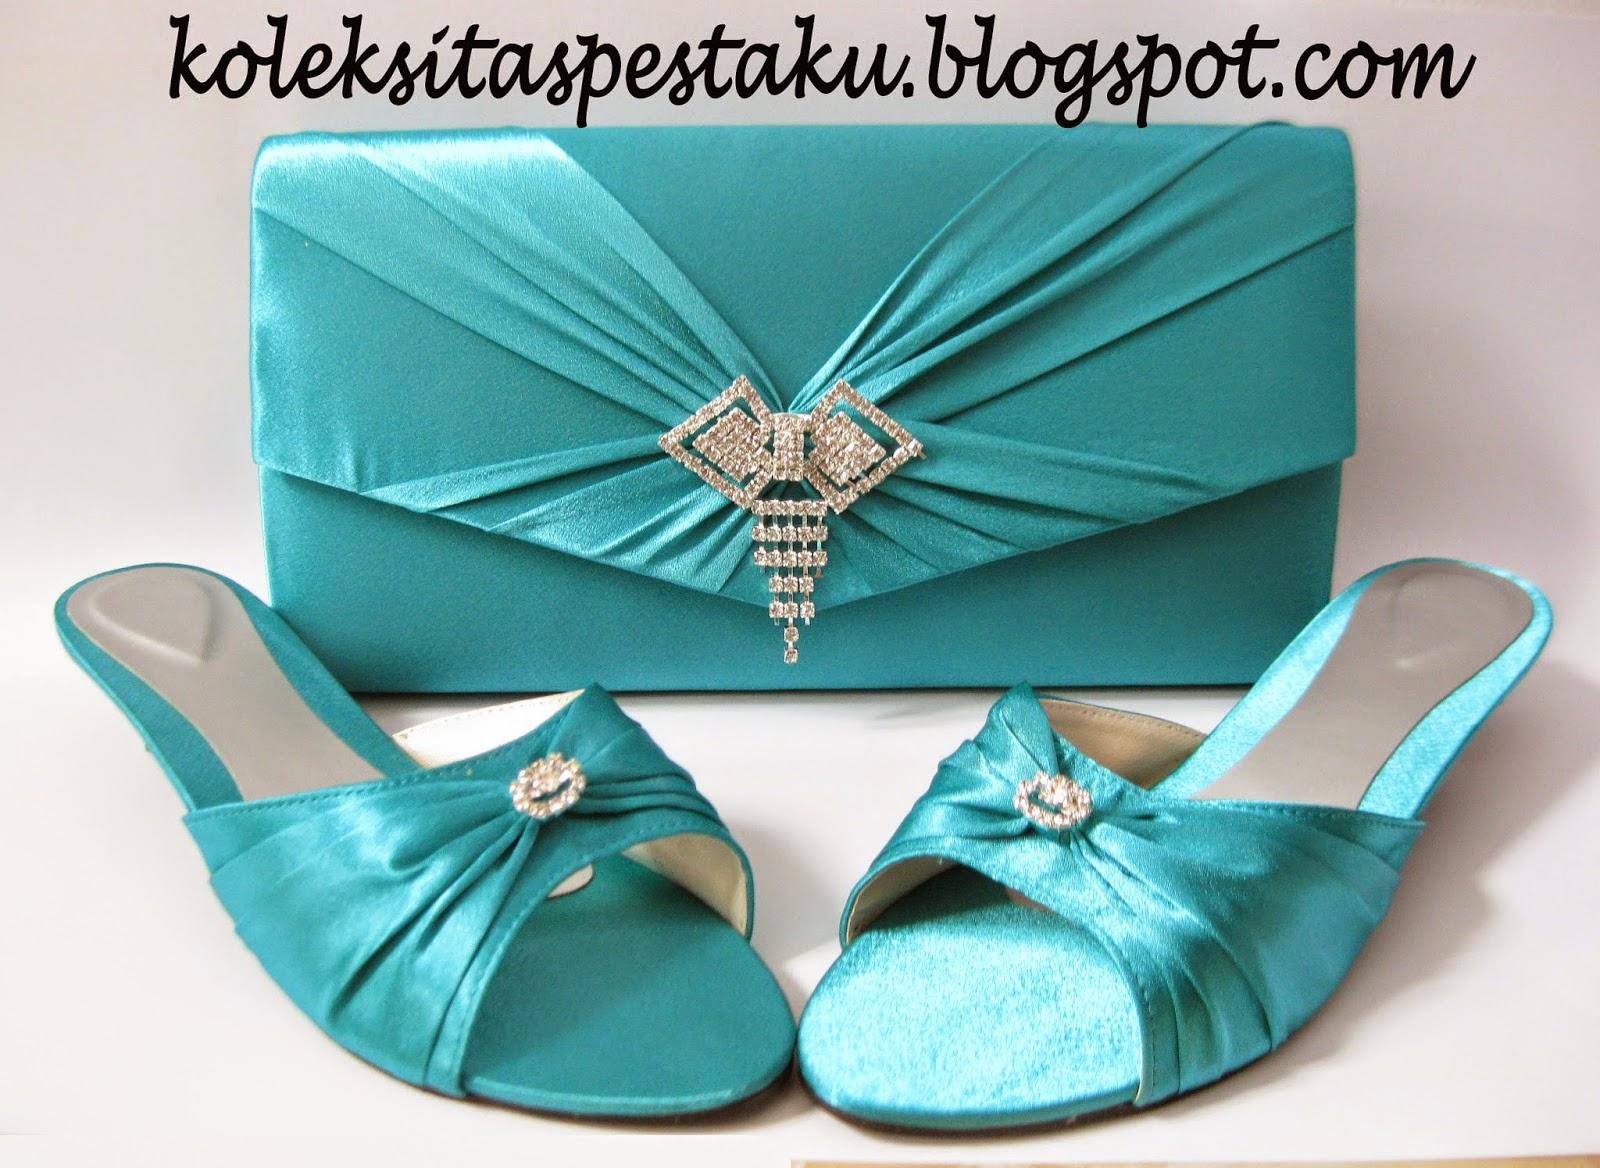 Biru Tosca Tas Pesta Dan Sepatu Pesta Pesanan Pelanggan